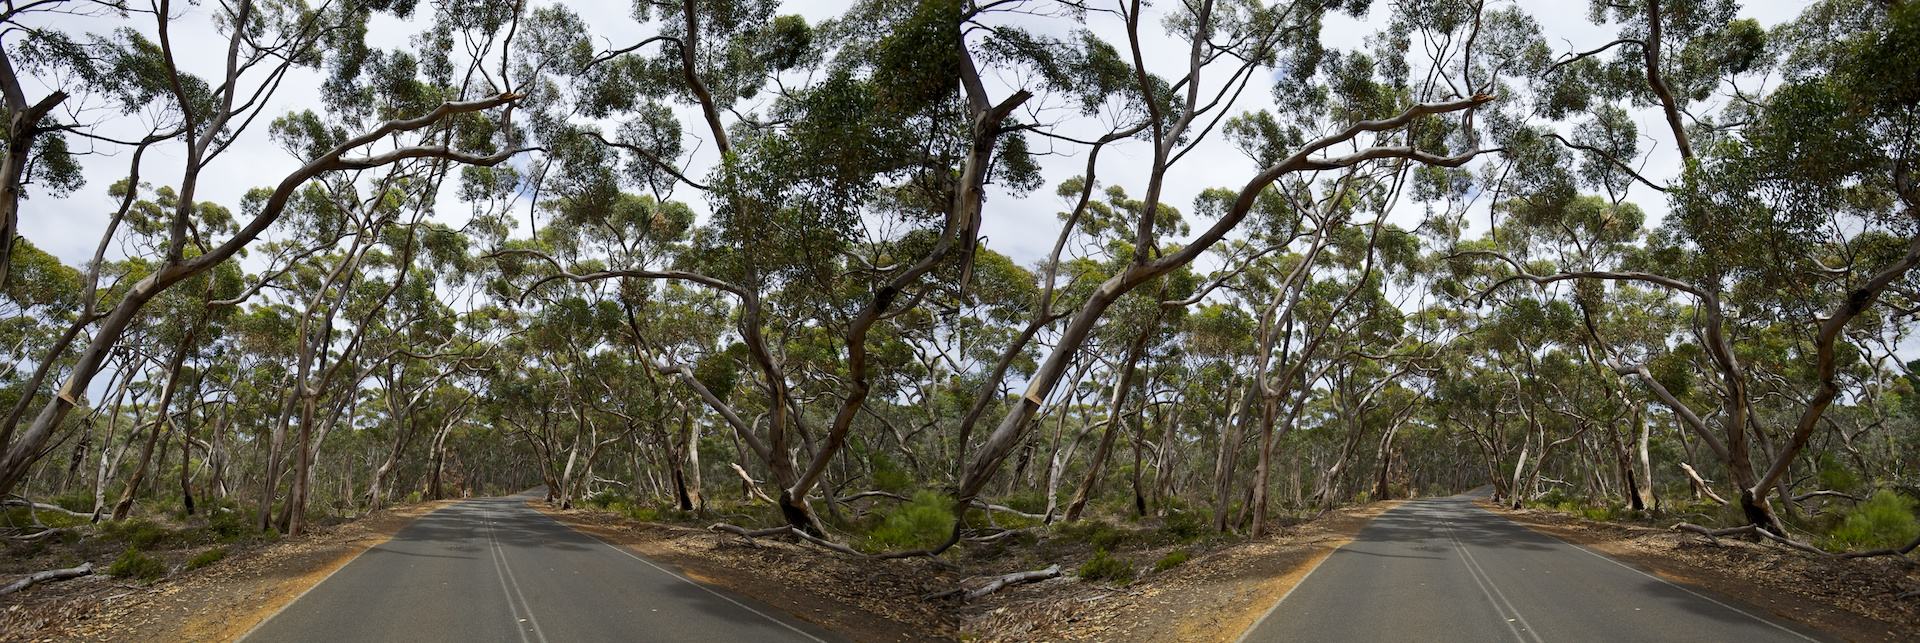 2011 2010 South Australia, Kangaroo Island, Остров Кенгуру, Южная Австралия, Flinders Chase, forrest, лес, 3D stereo cross-eyed, стерео